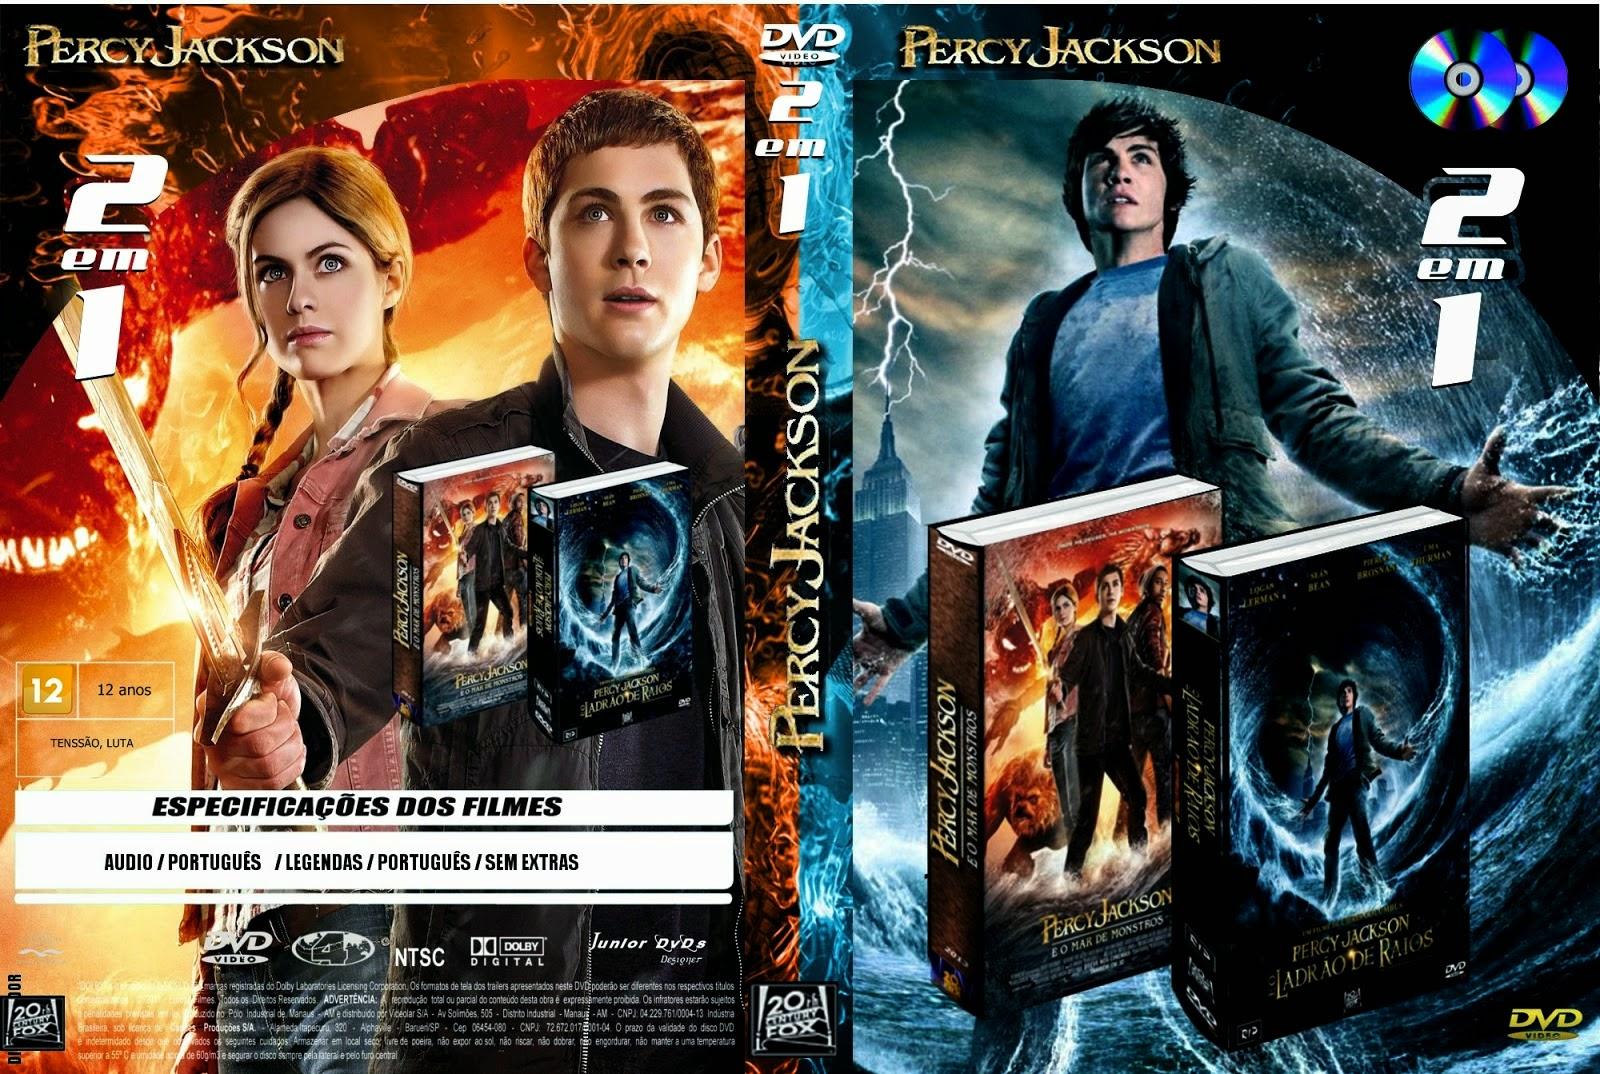 Percy Jackson 2 Film